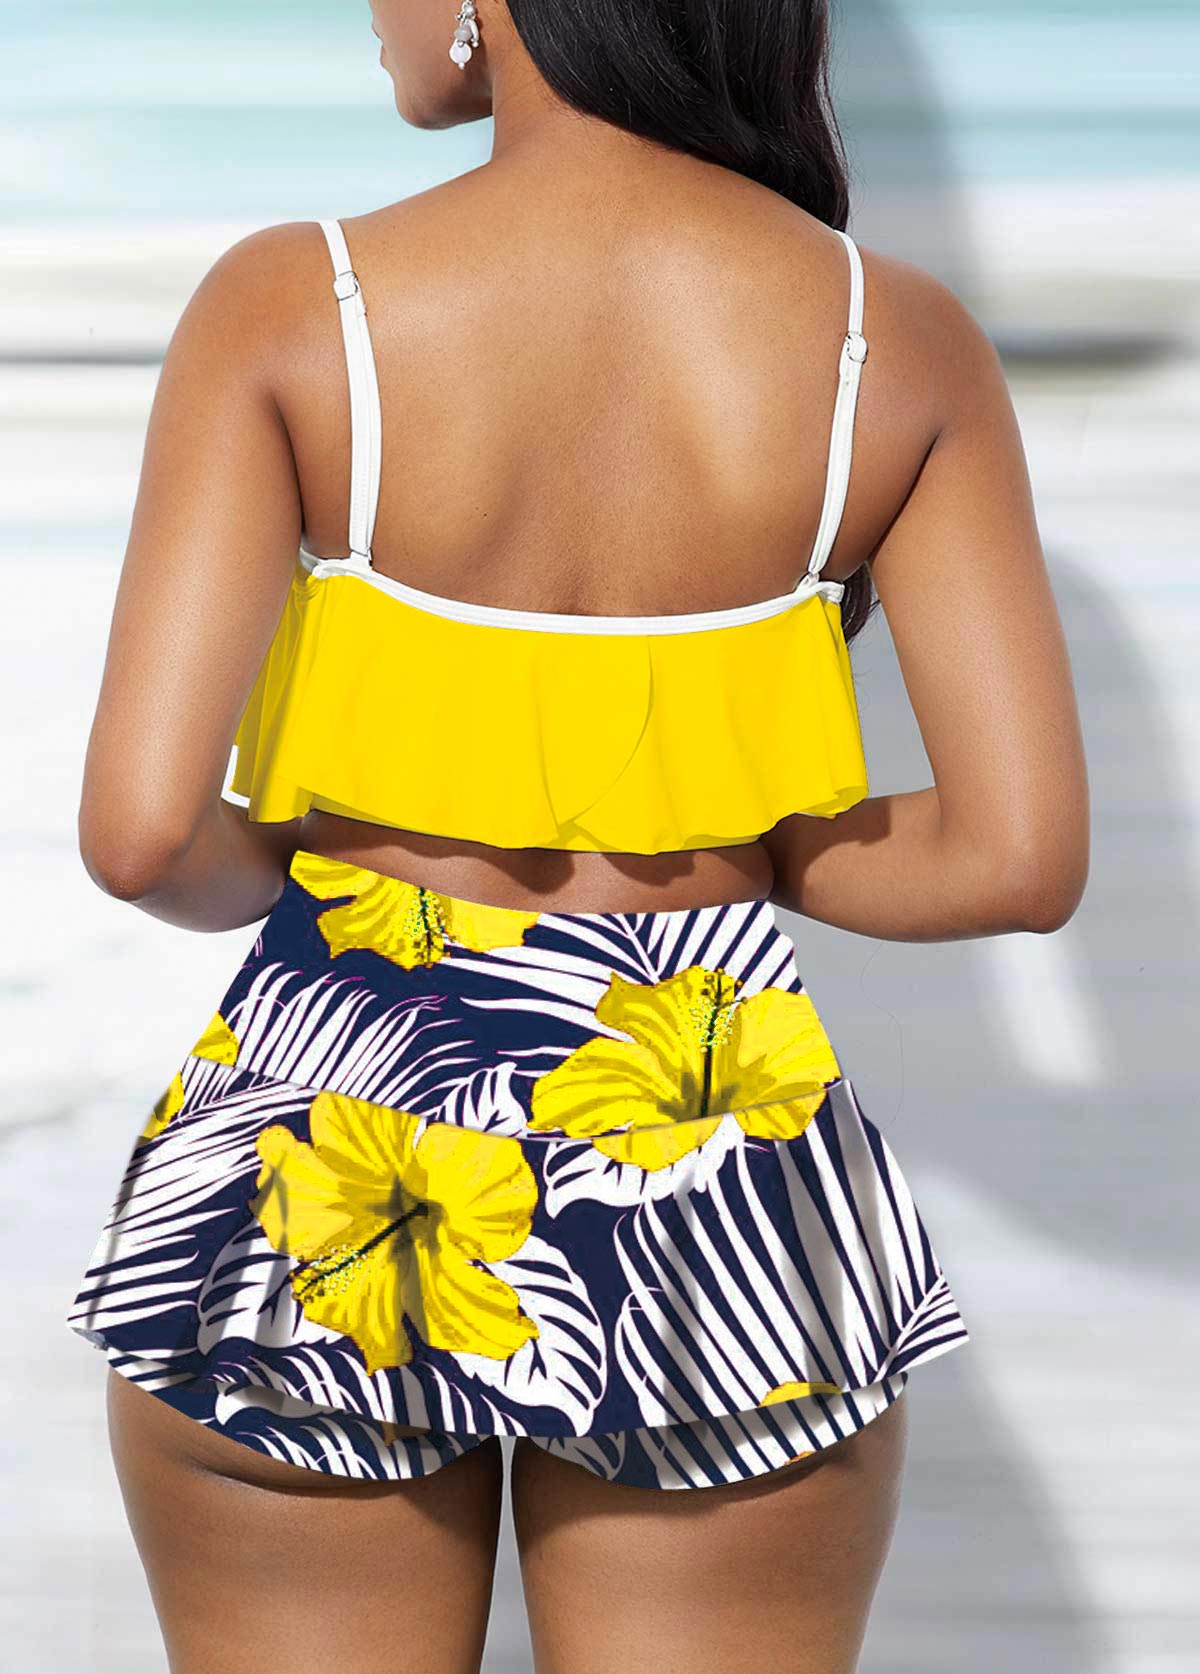 Ruffle Overlay Spaghetti Strap Swimwear Top and Floral Print Pantskirt